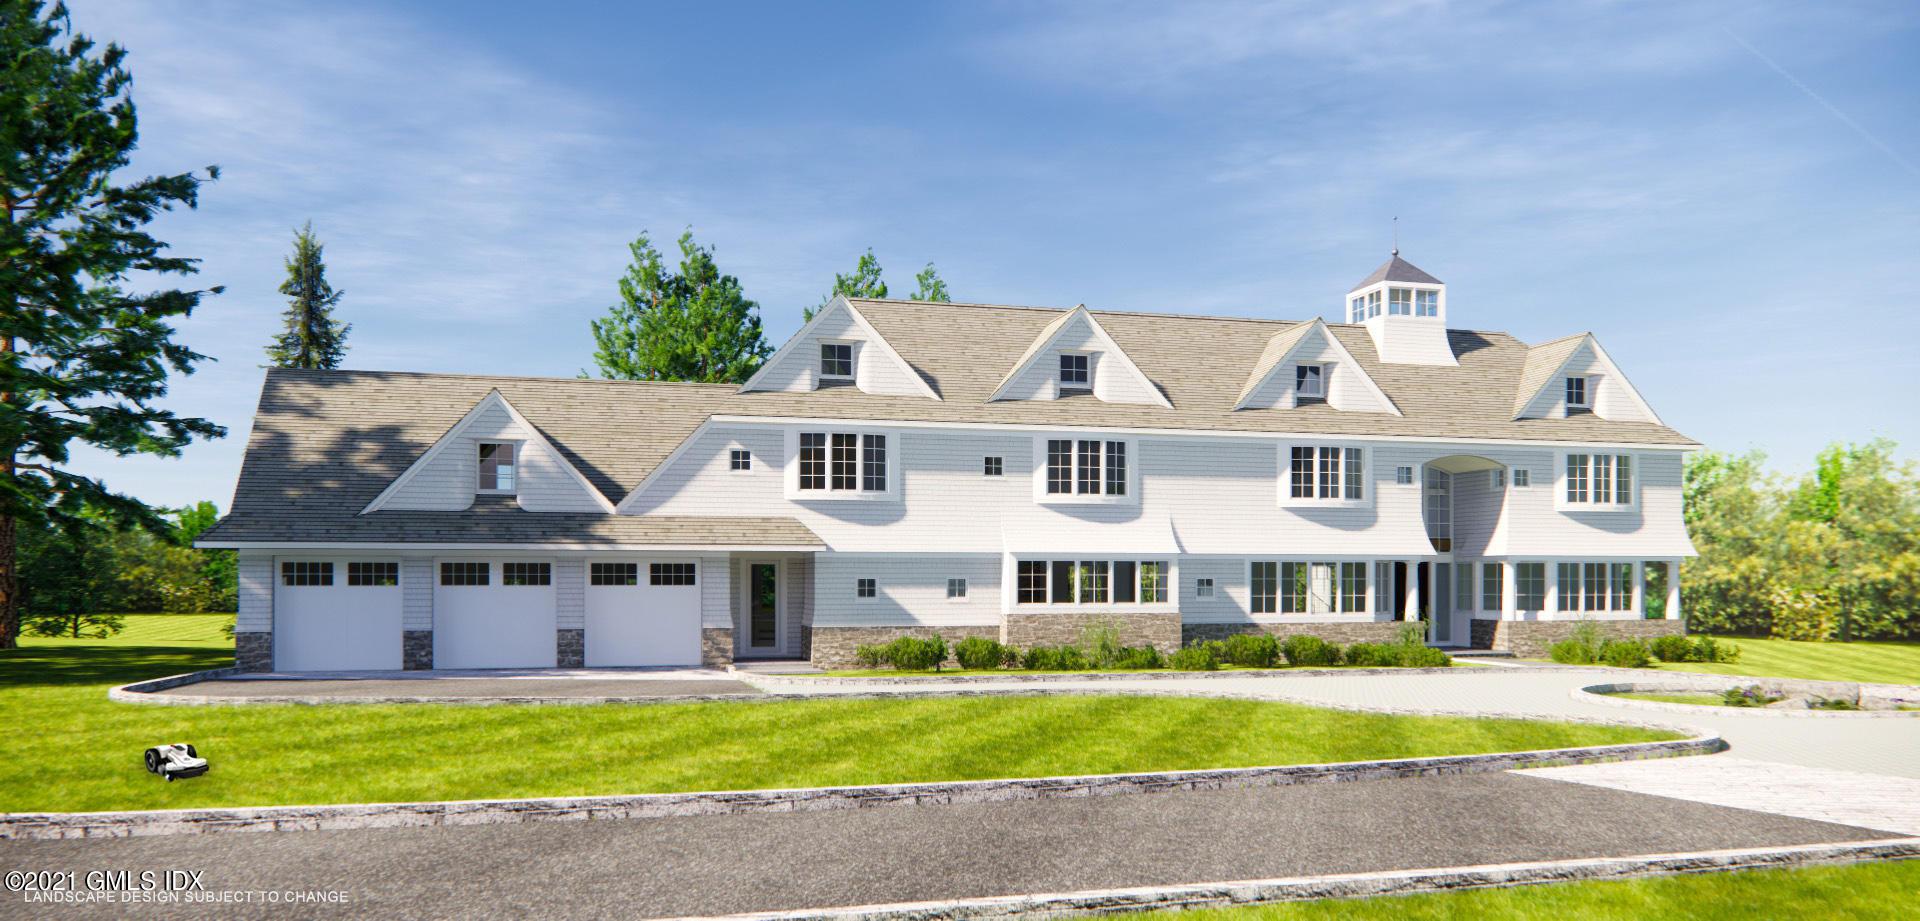 3 Stillman Lane, Greenwich, Connecticut 06831, 6 Bedrooms Bedrooms, ,6 BathroomsBathrooms,Single family,For sale,Stillman,112017